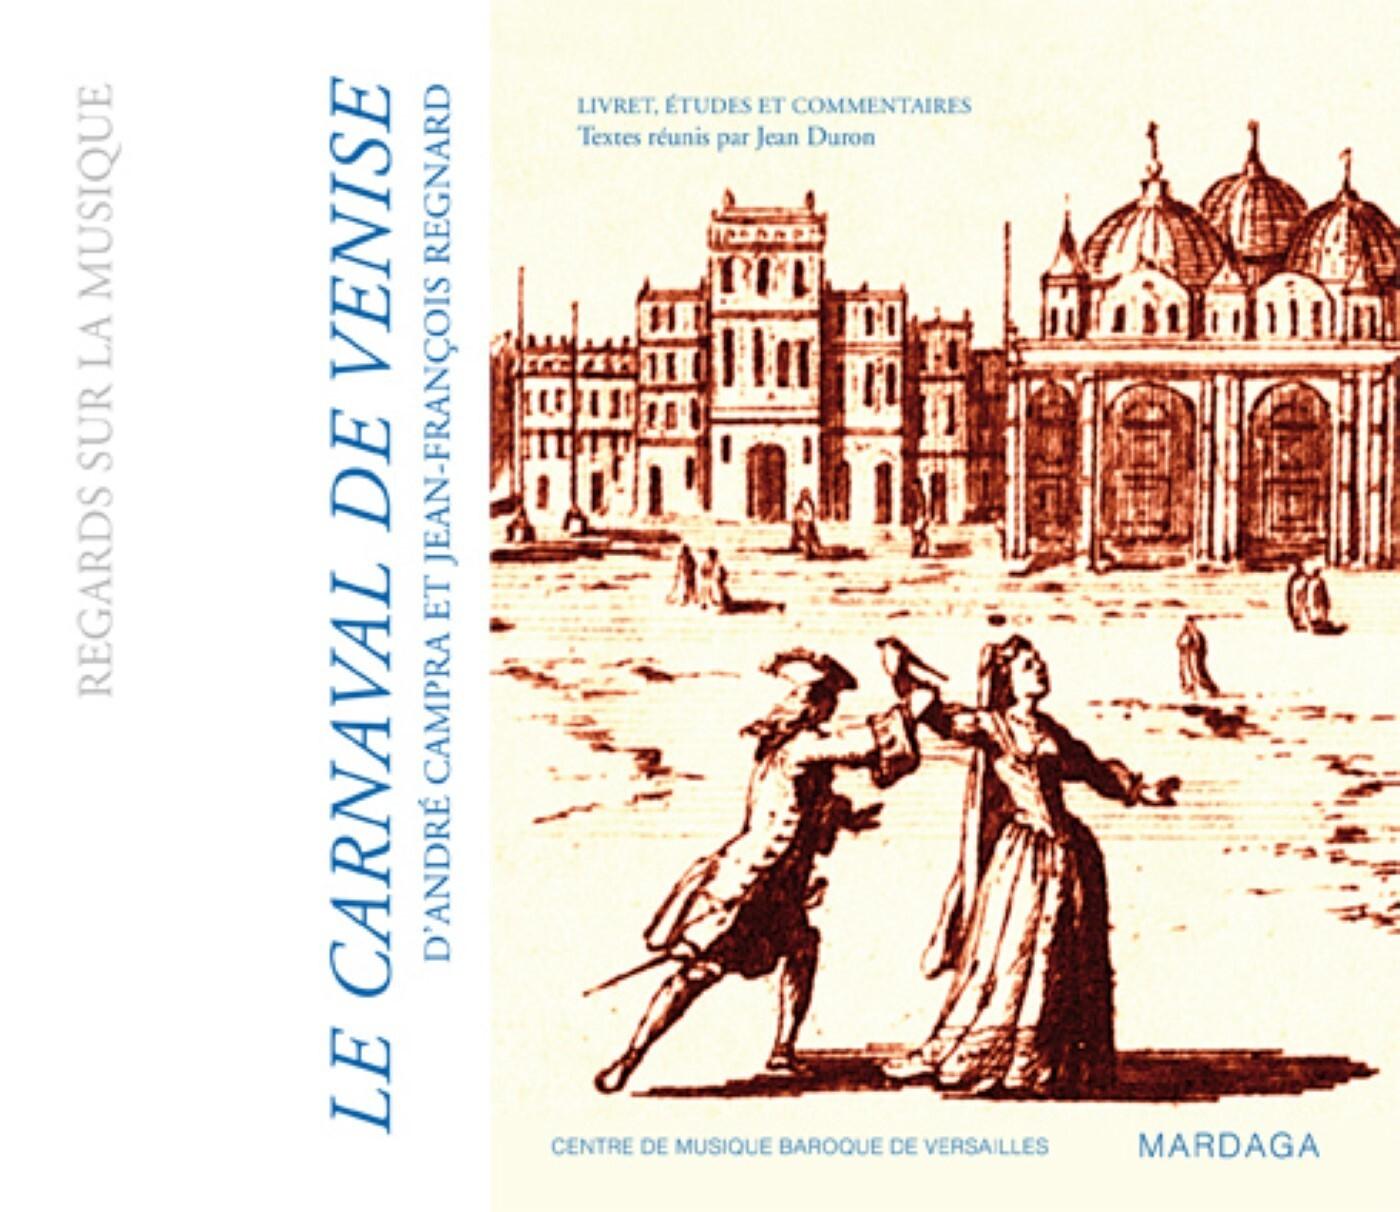 CARNAVAL DE VENISE D'A. CAMPRA ET J-F REGNARD